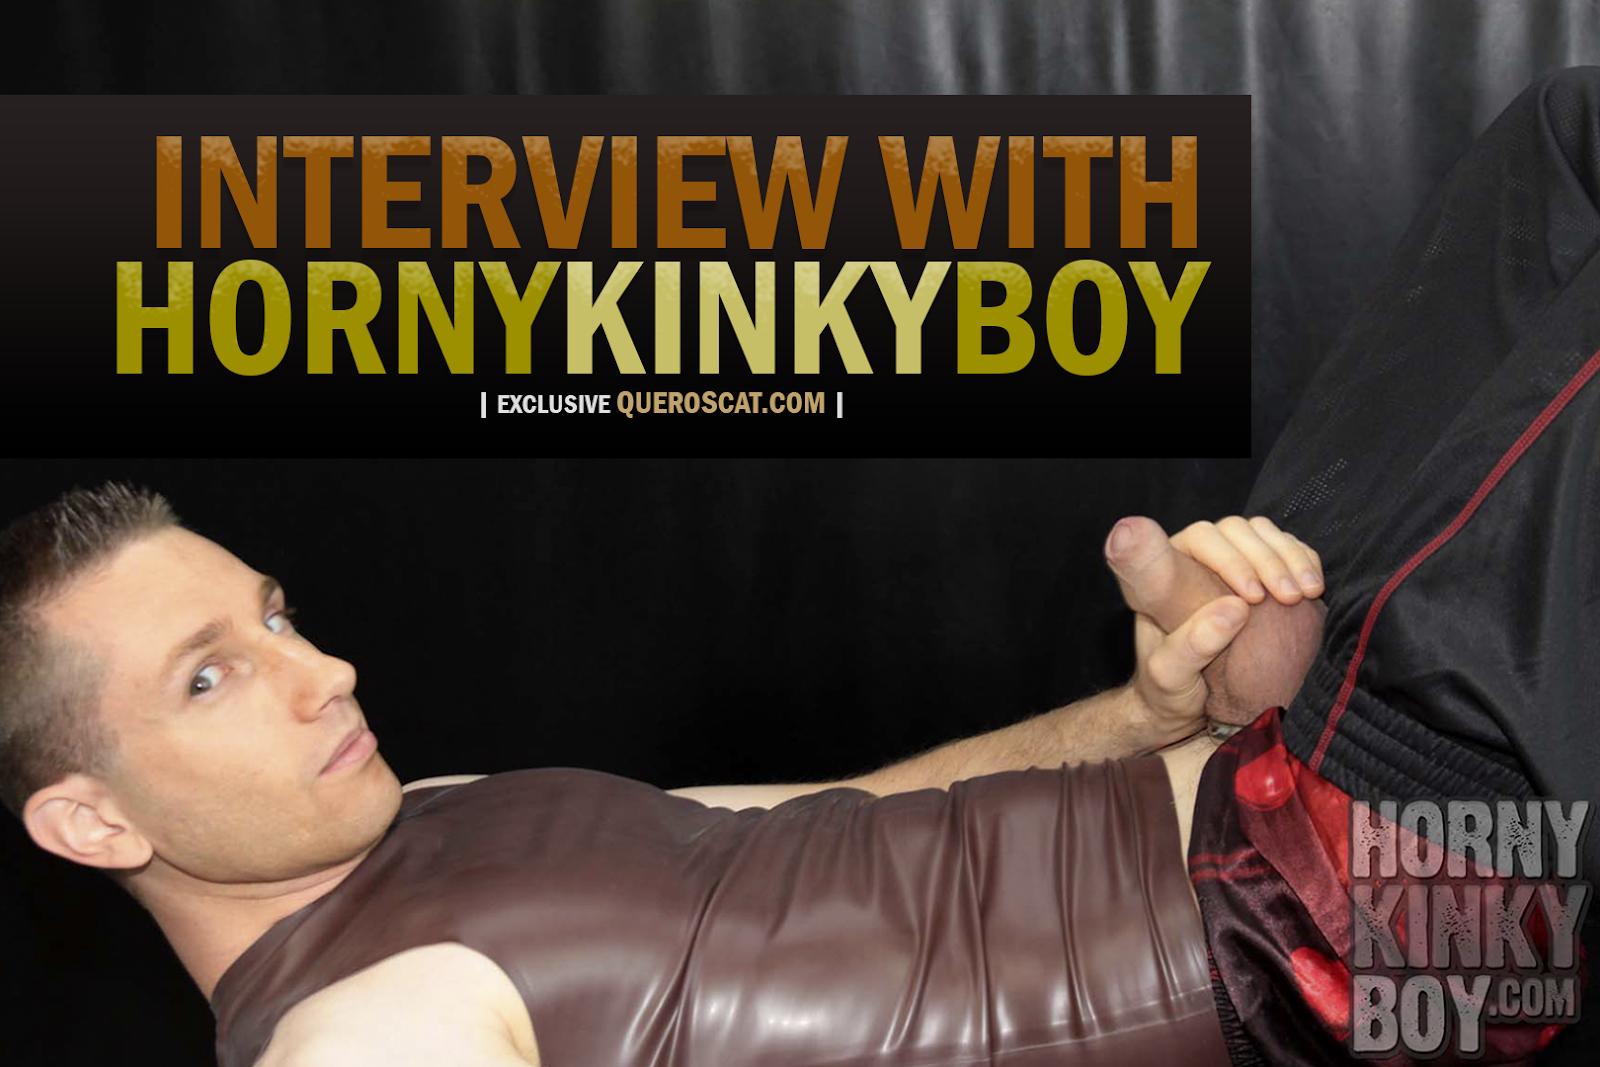 Gay Scat Porn Shooting With Main Camera Hornykinkyboy Com